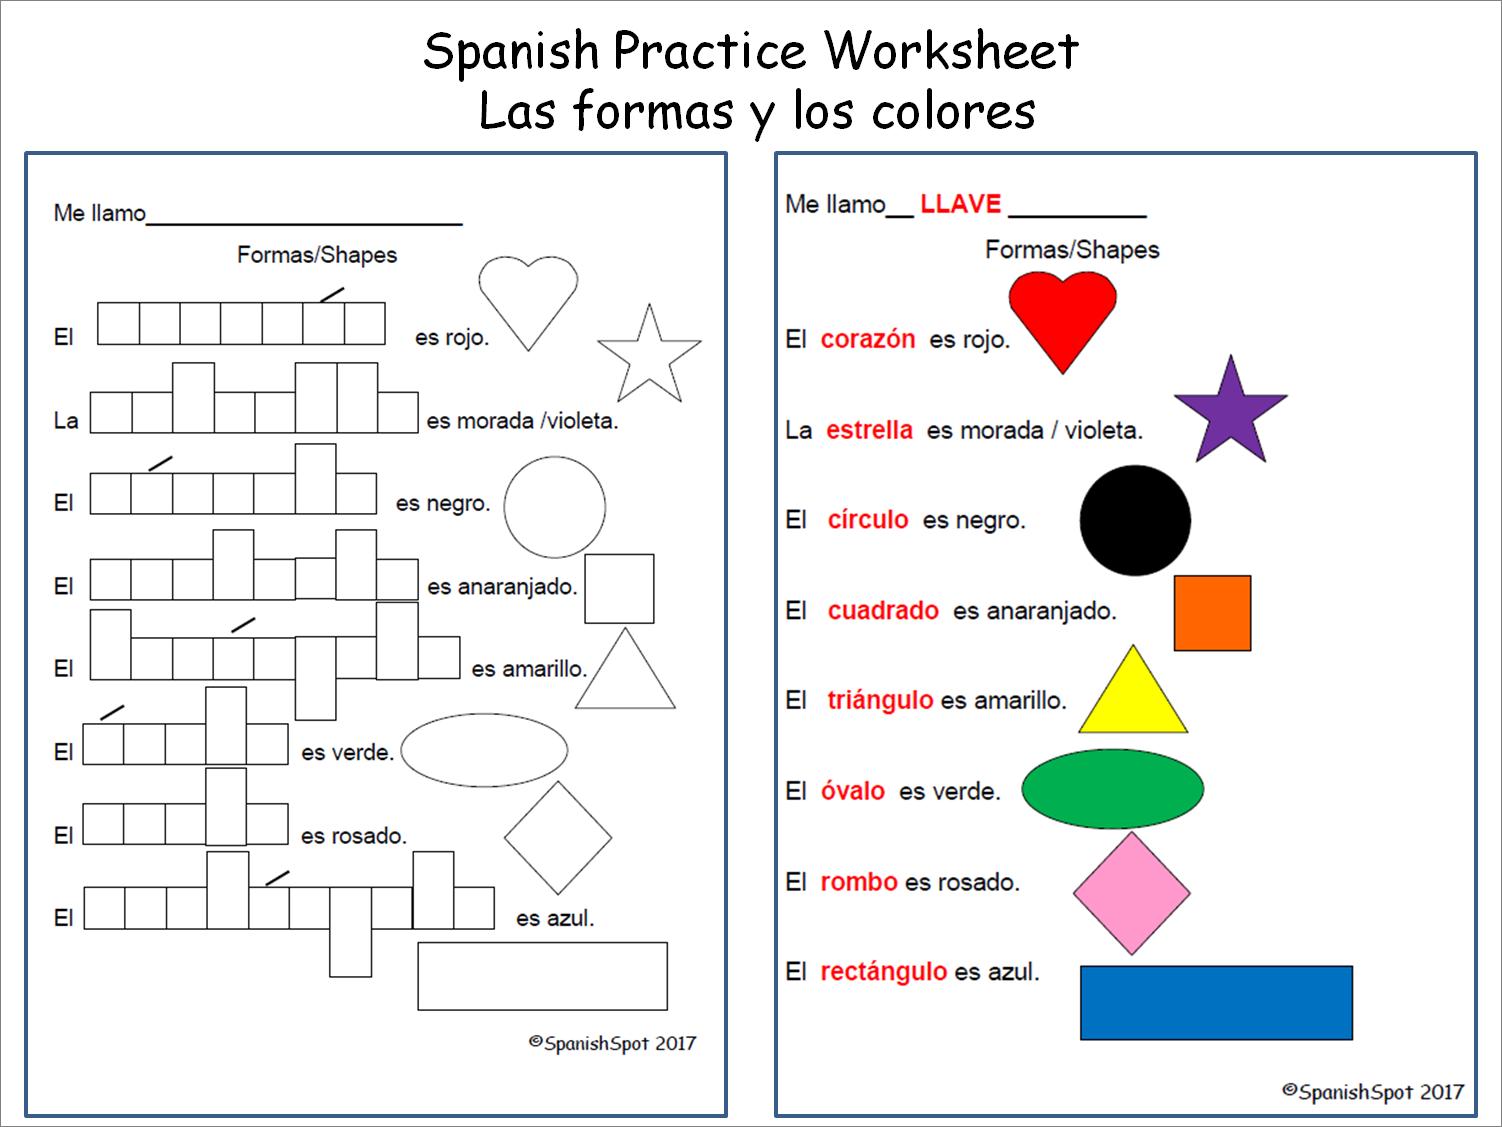 worksheet Worksheets In Spanish spanish shapes and colors worksheet worksheets worksheet